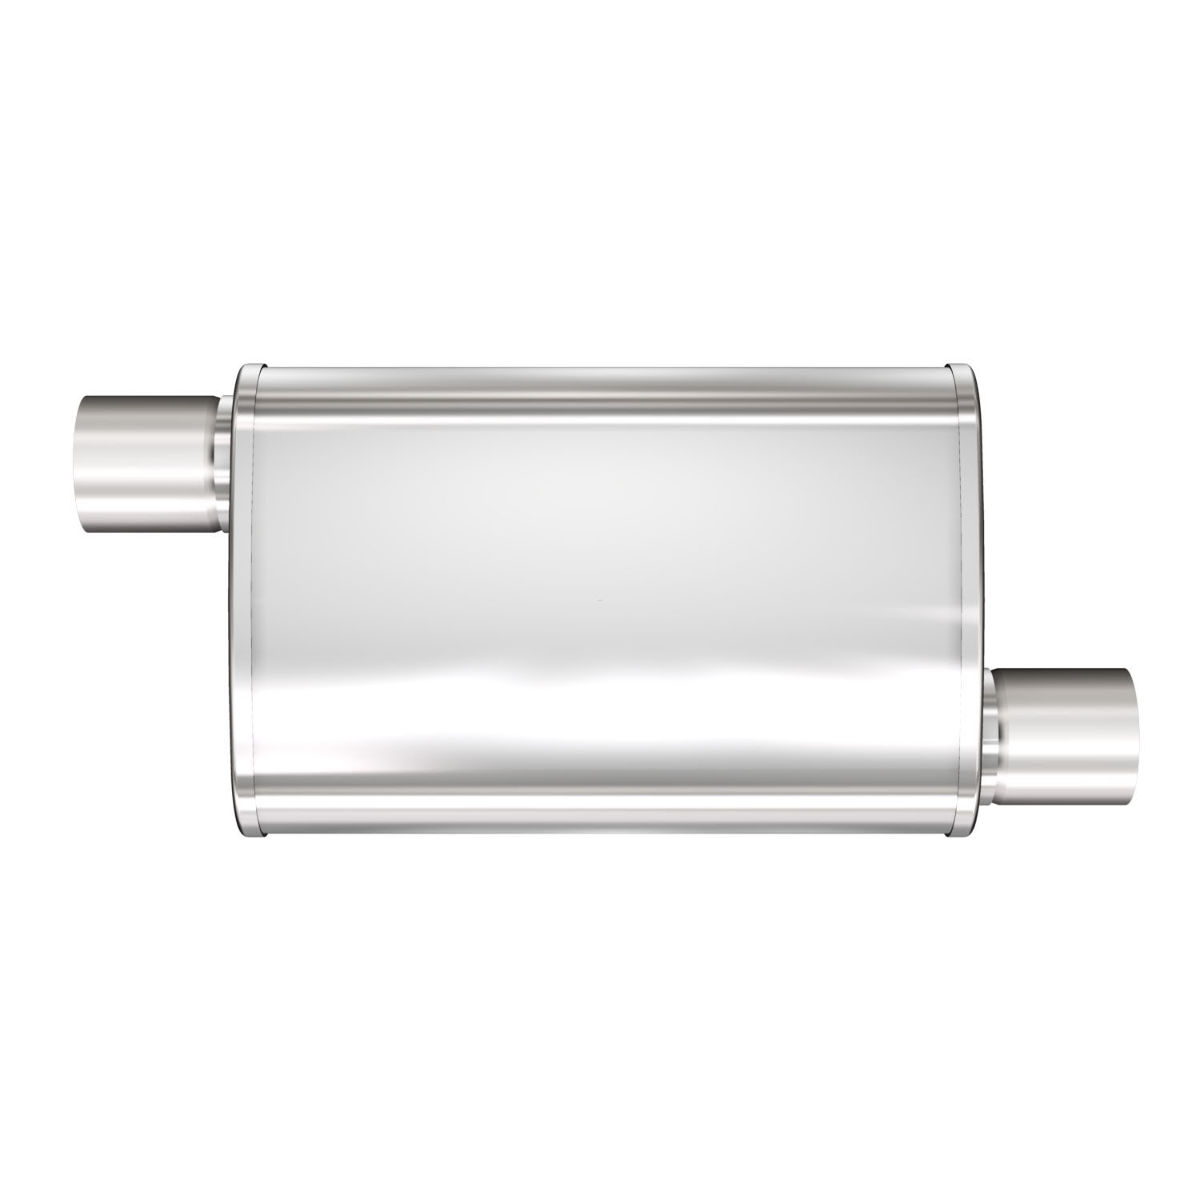 "MagnaFlow XL 2.5/"" O//O 3 Chamber Stainless Steel Turbo Muffler 13236"